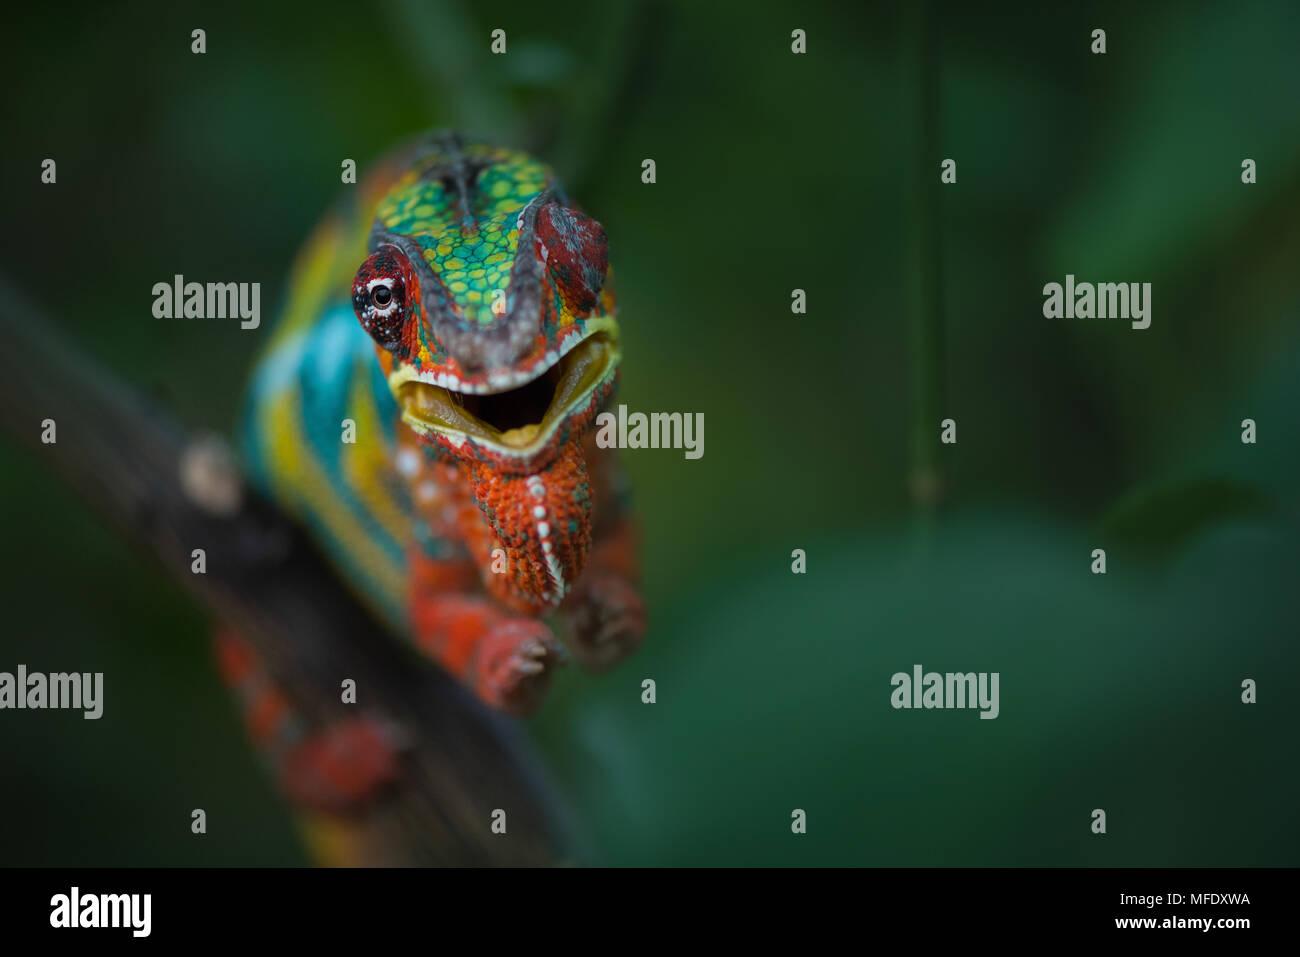 Panther chameleon con colori luminosi / Furcifer pardalis / arrabbiato chameleon / sibilo chameleon / Madagascar wildlife Immagini Stock